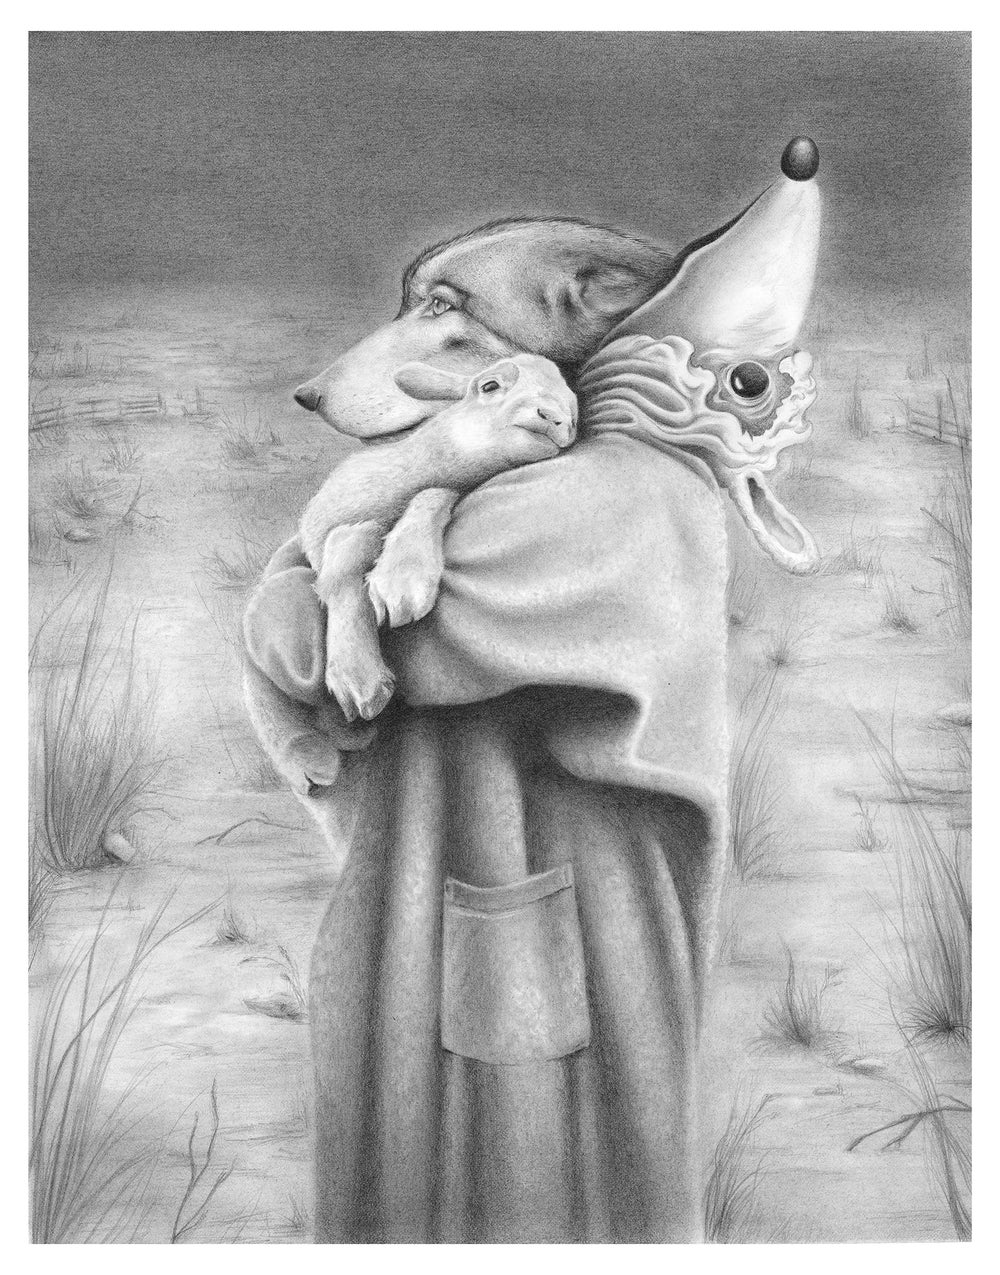 Image of WOLF AND LAMB (Original pencil drawing)